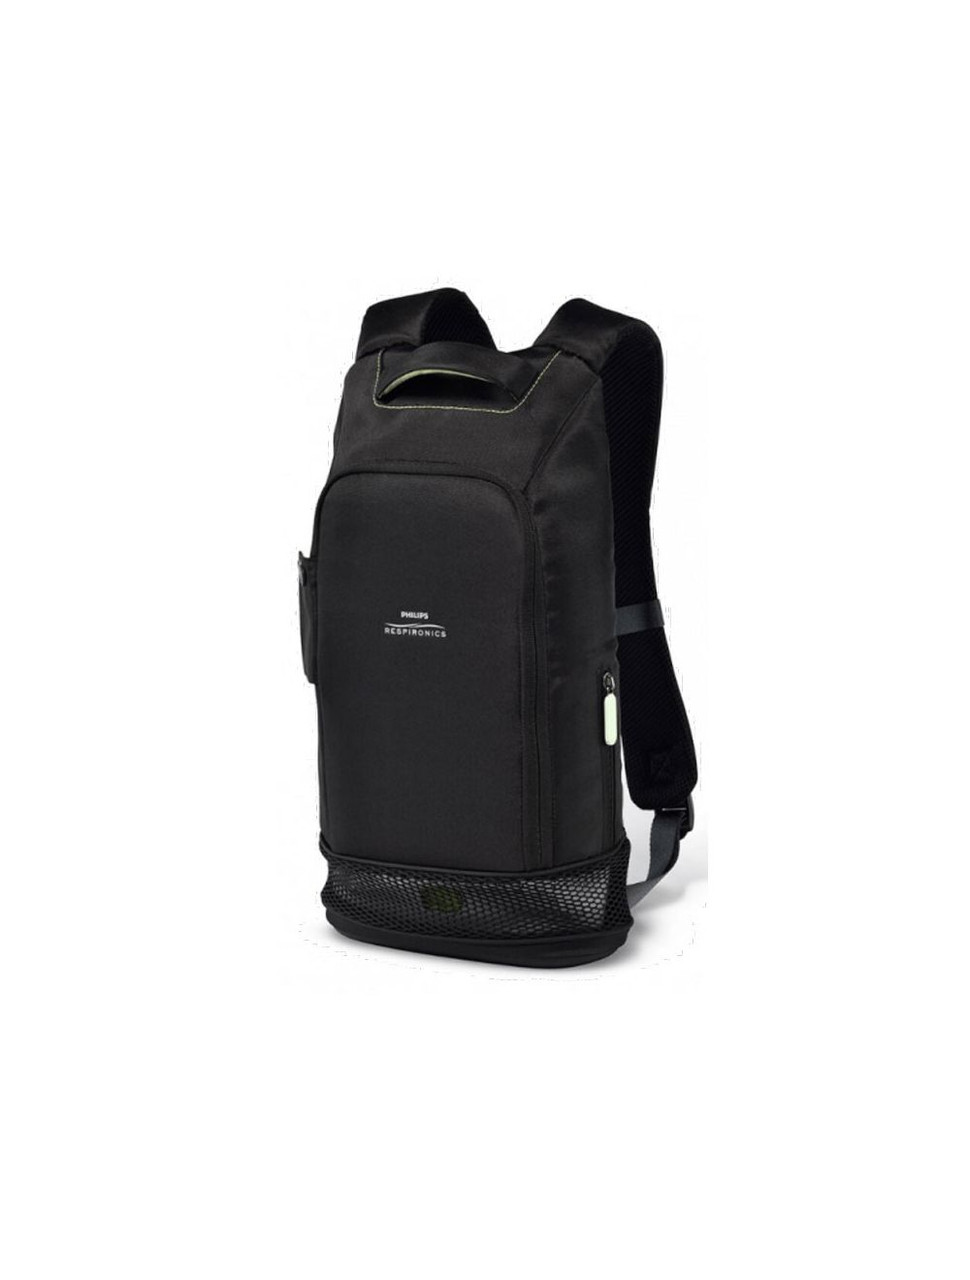 Philips Respironics SimplyGo Mini Backpack Black